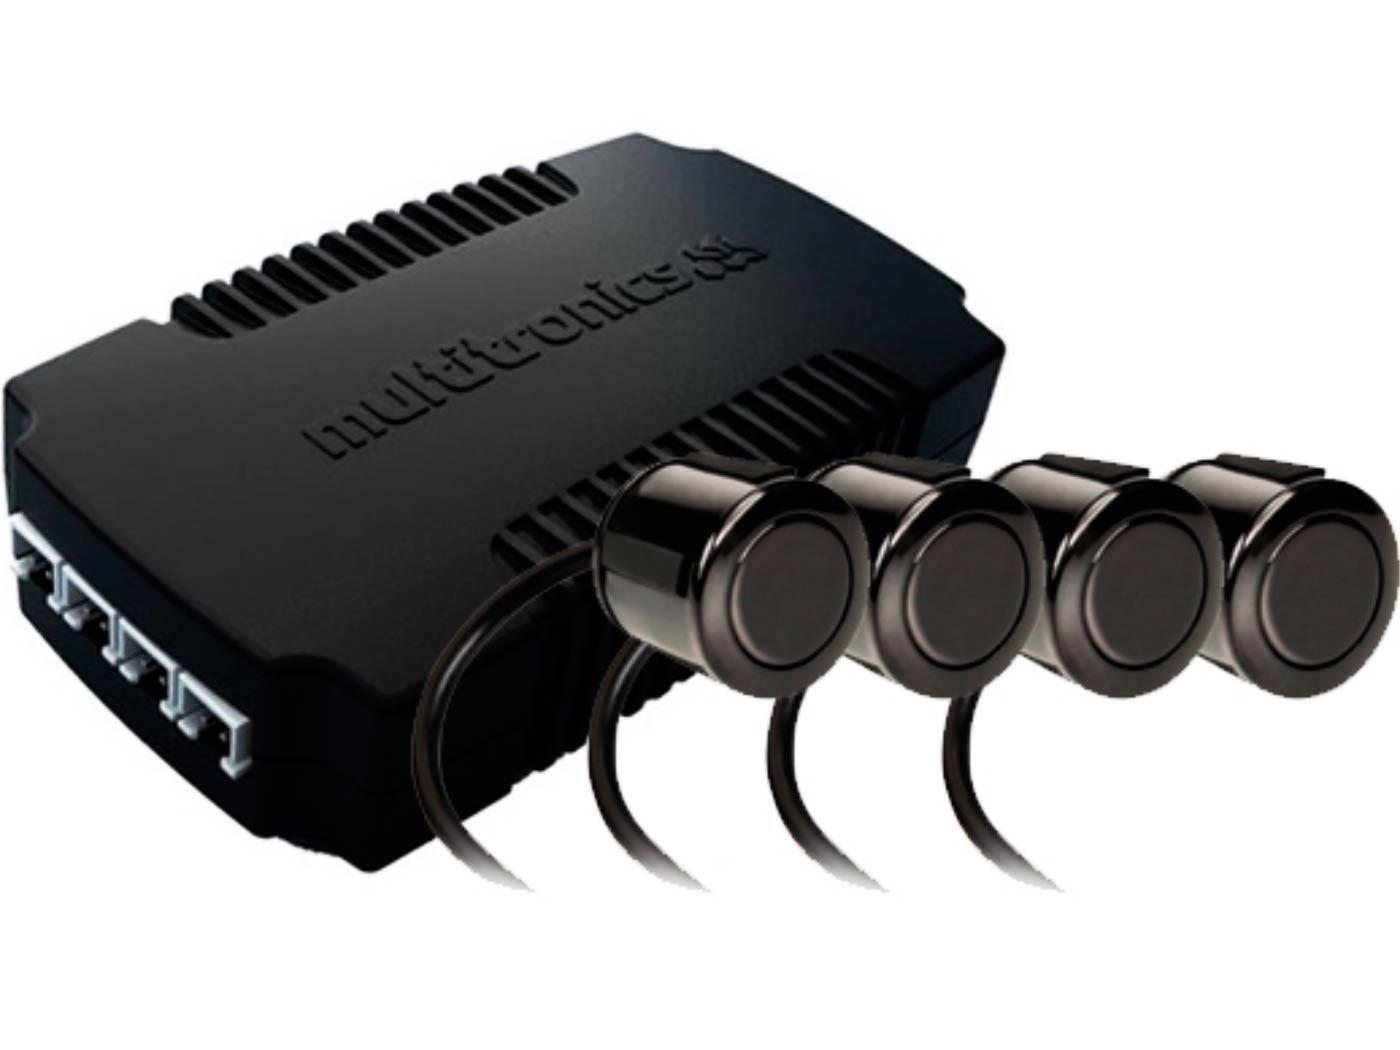 ����������� ����� Multitronics PU-4TC black Multitronics_PU-4TC_BL